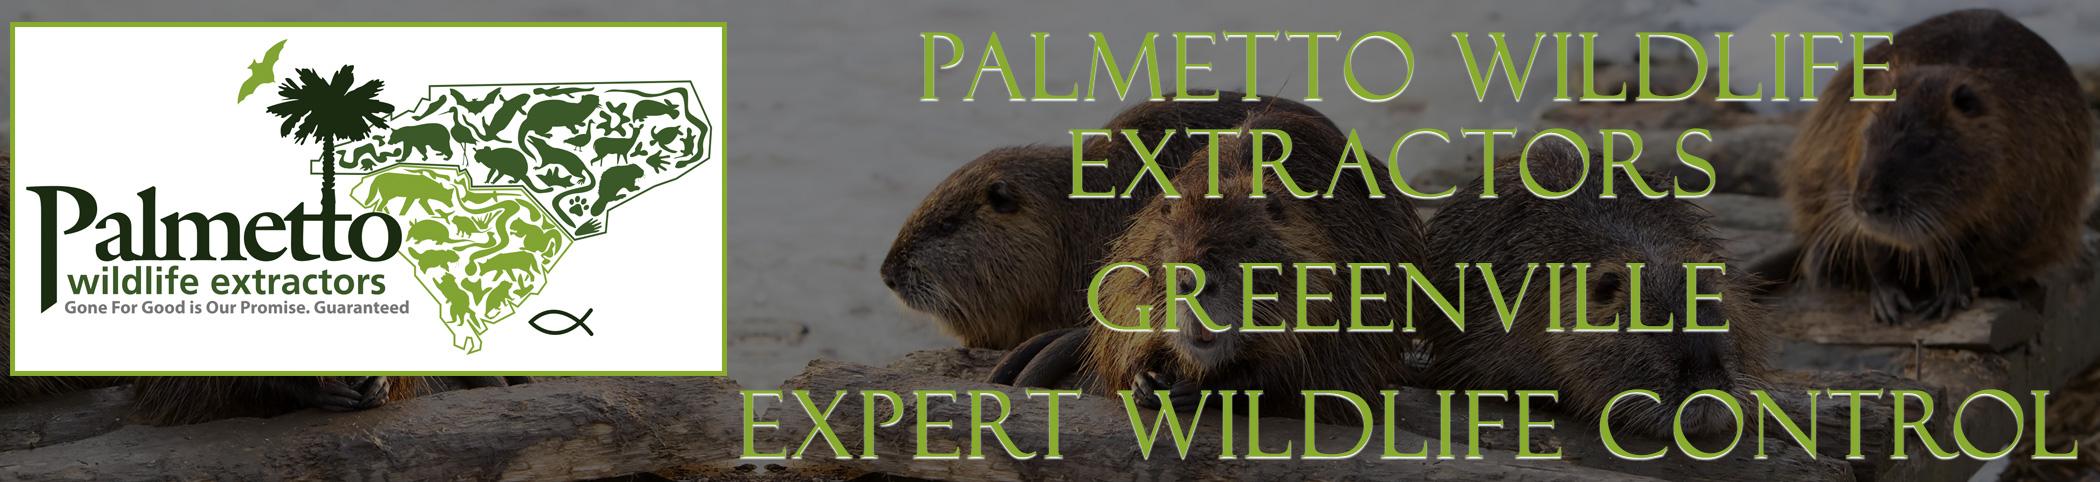 Palmetto Wildlife Extractors greenville south carolina header image